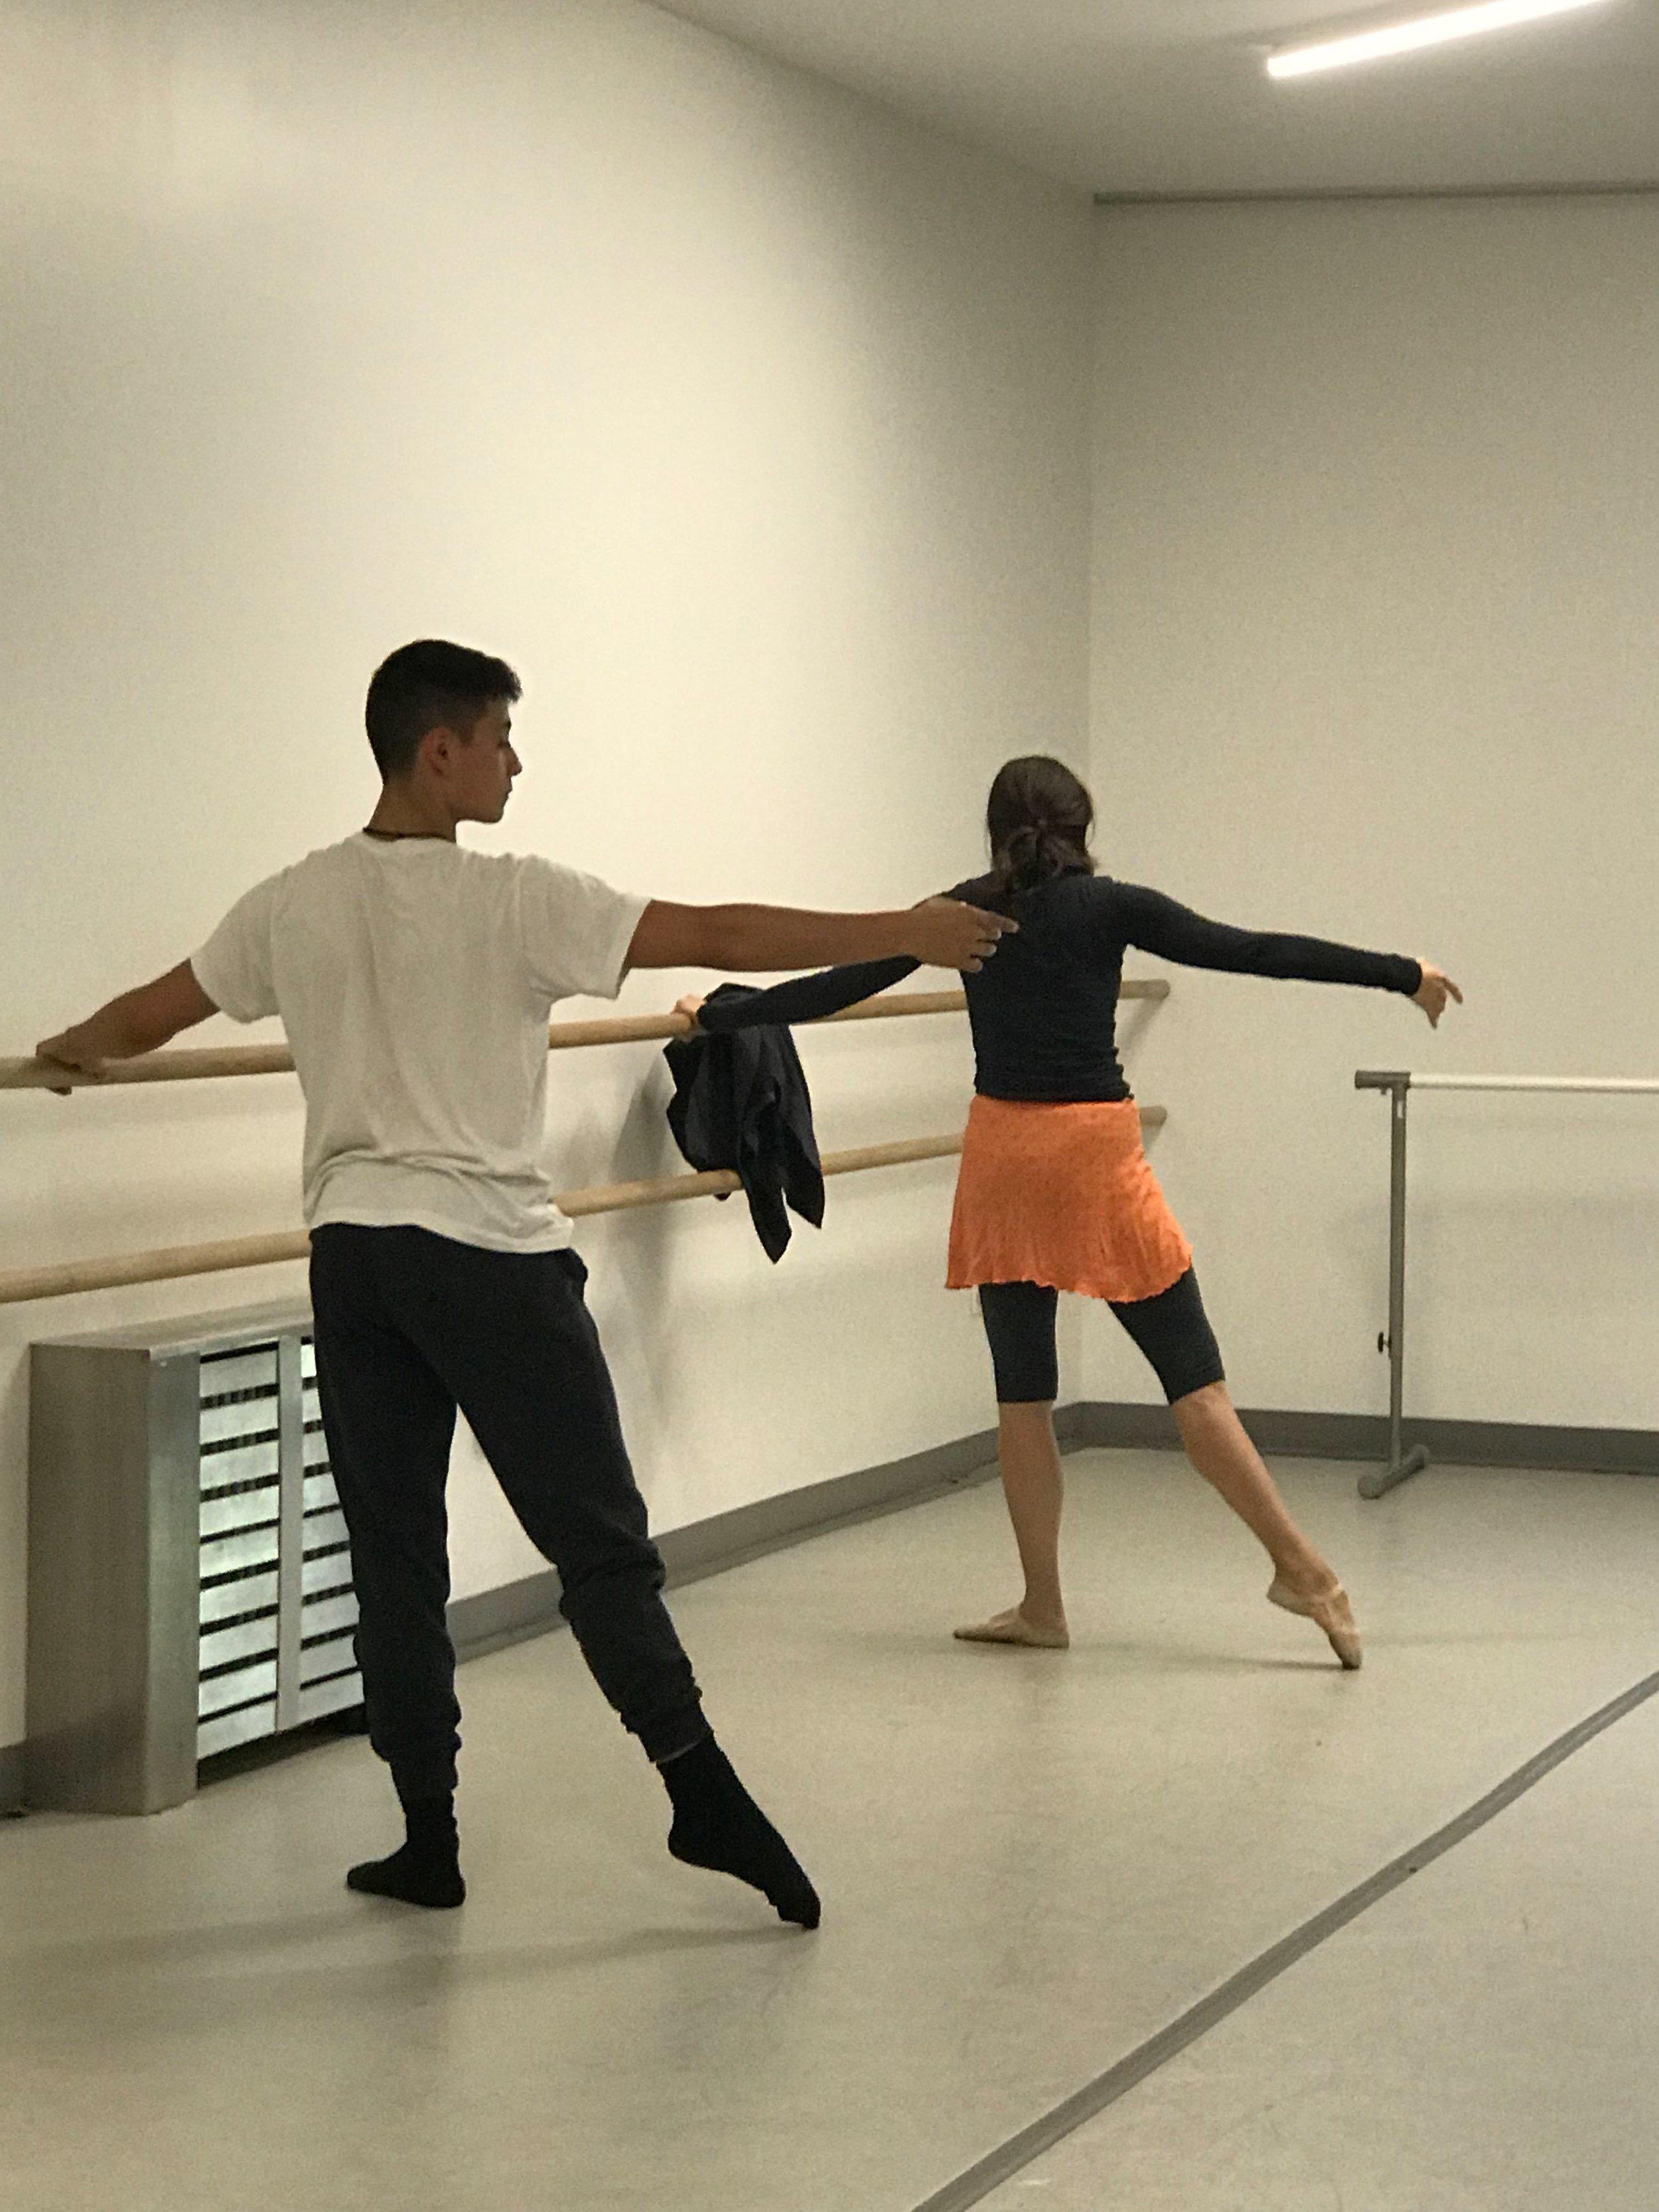 Ballet teacher Elyssa Dole demonstrates for student Mateo Vidals.